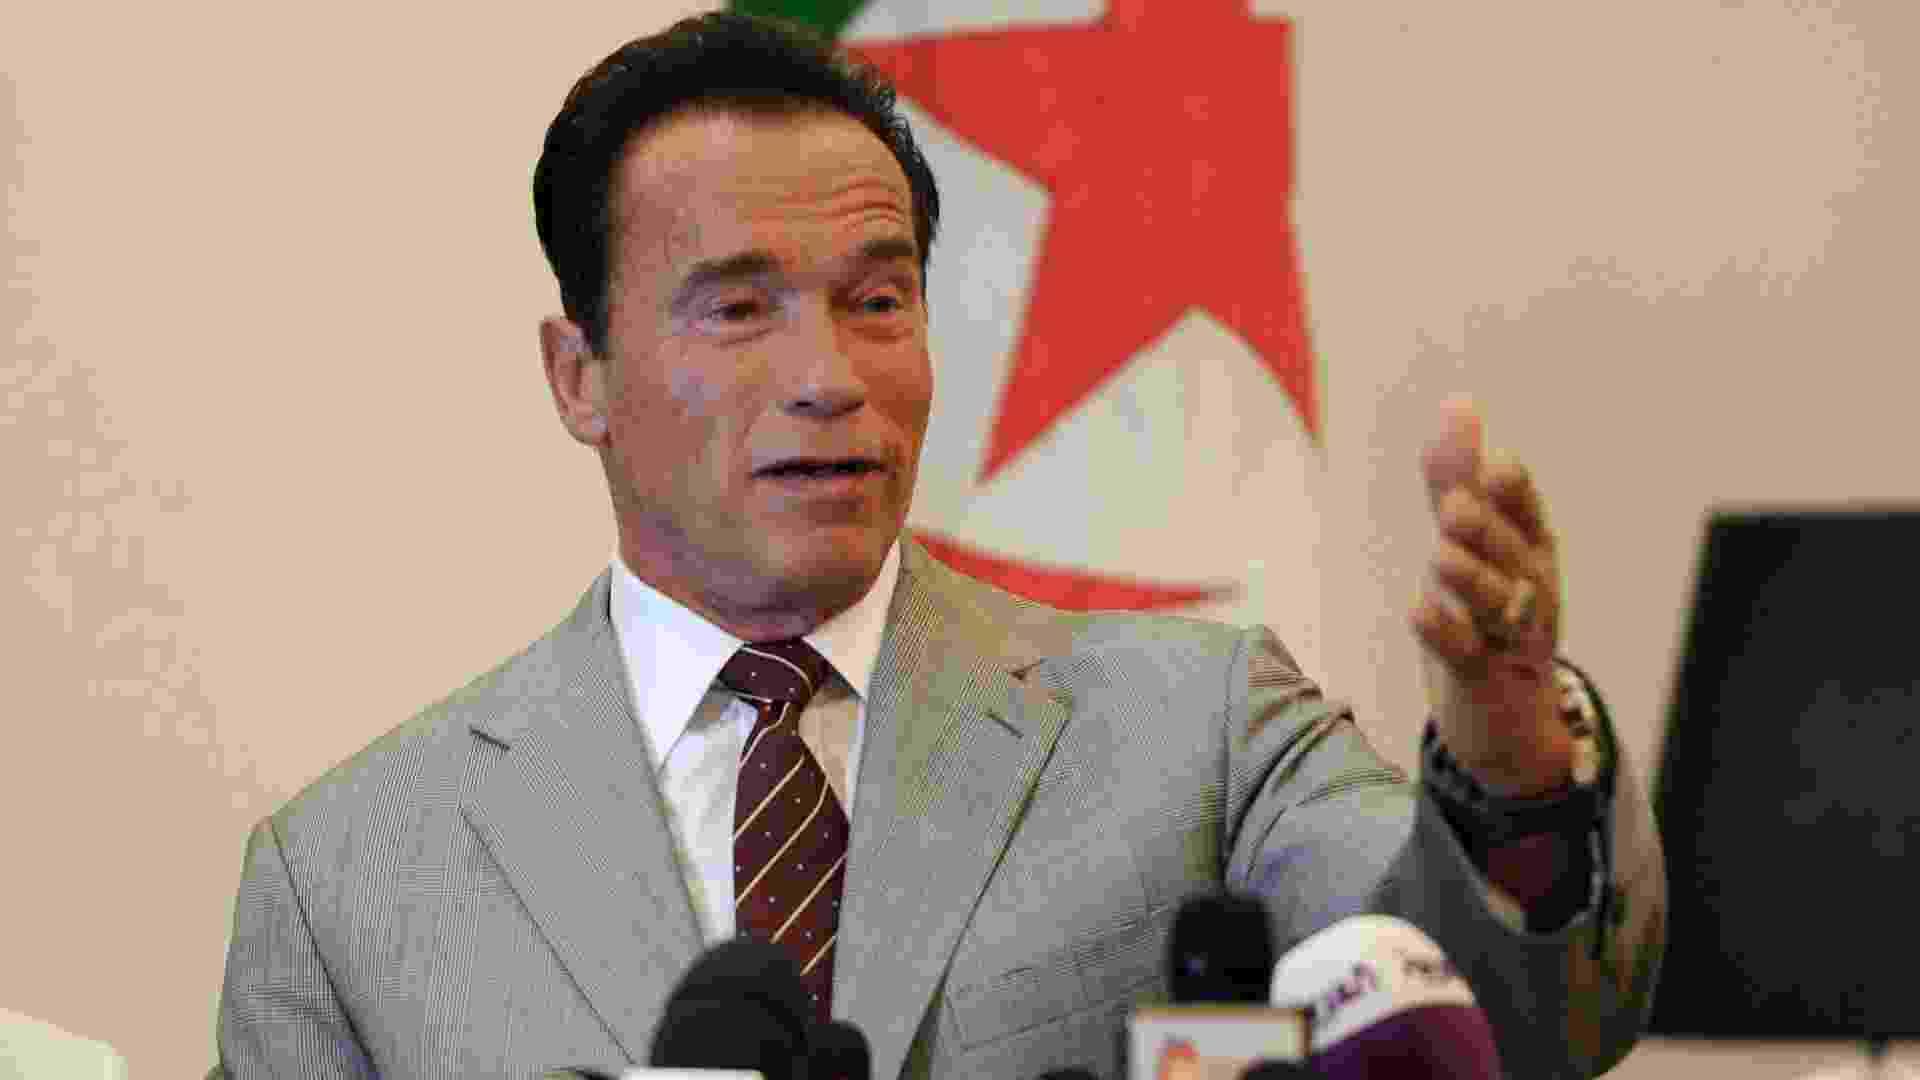 25.jun.2013 - Arnold  Schwarzenegger fala sobre sua ONG de proteção ao meio ambiente na Argélia - Farouk Batiche/AFP Phoo